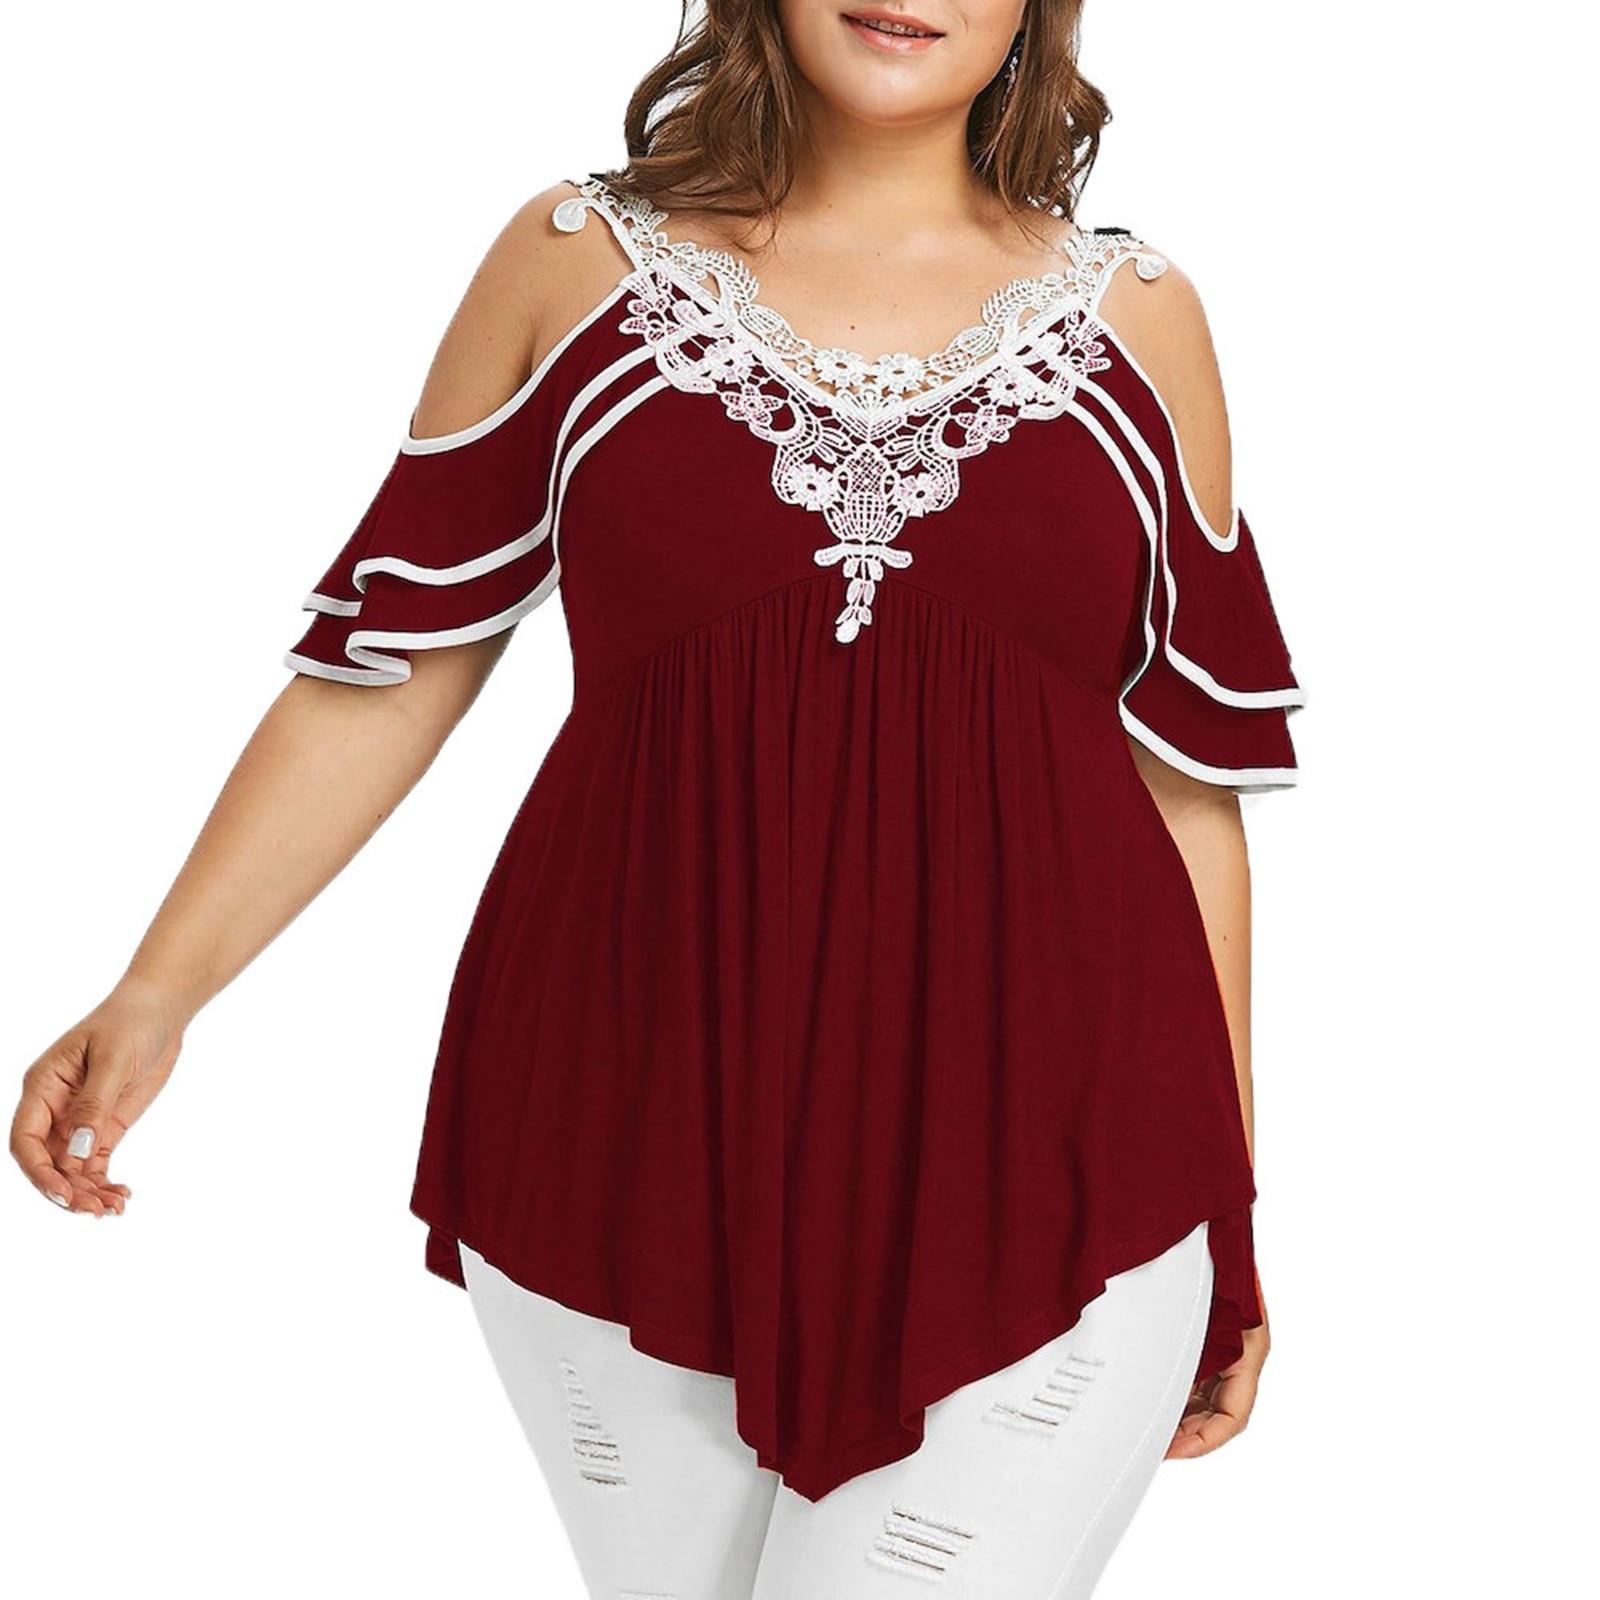 Plus Size Lotus Leaf Woman T Shirt Hollow Strapless Summer Solid Color Irregular Hem Contrasting V Neck Stitching Tops Ladies